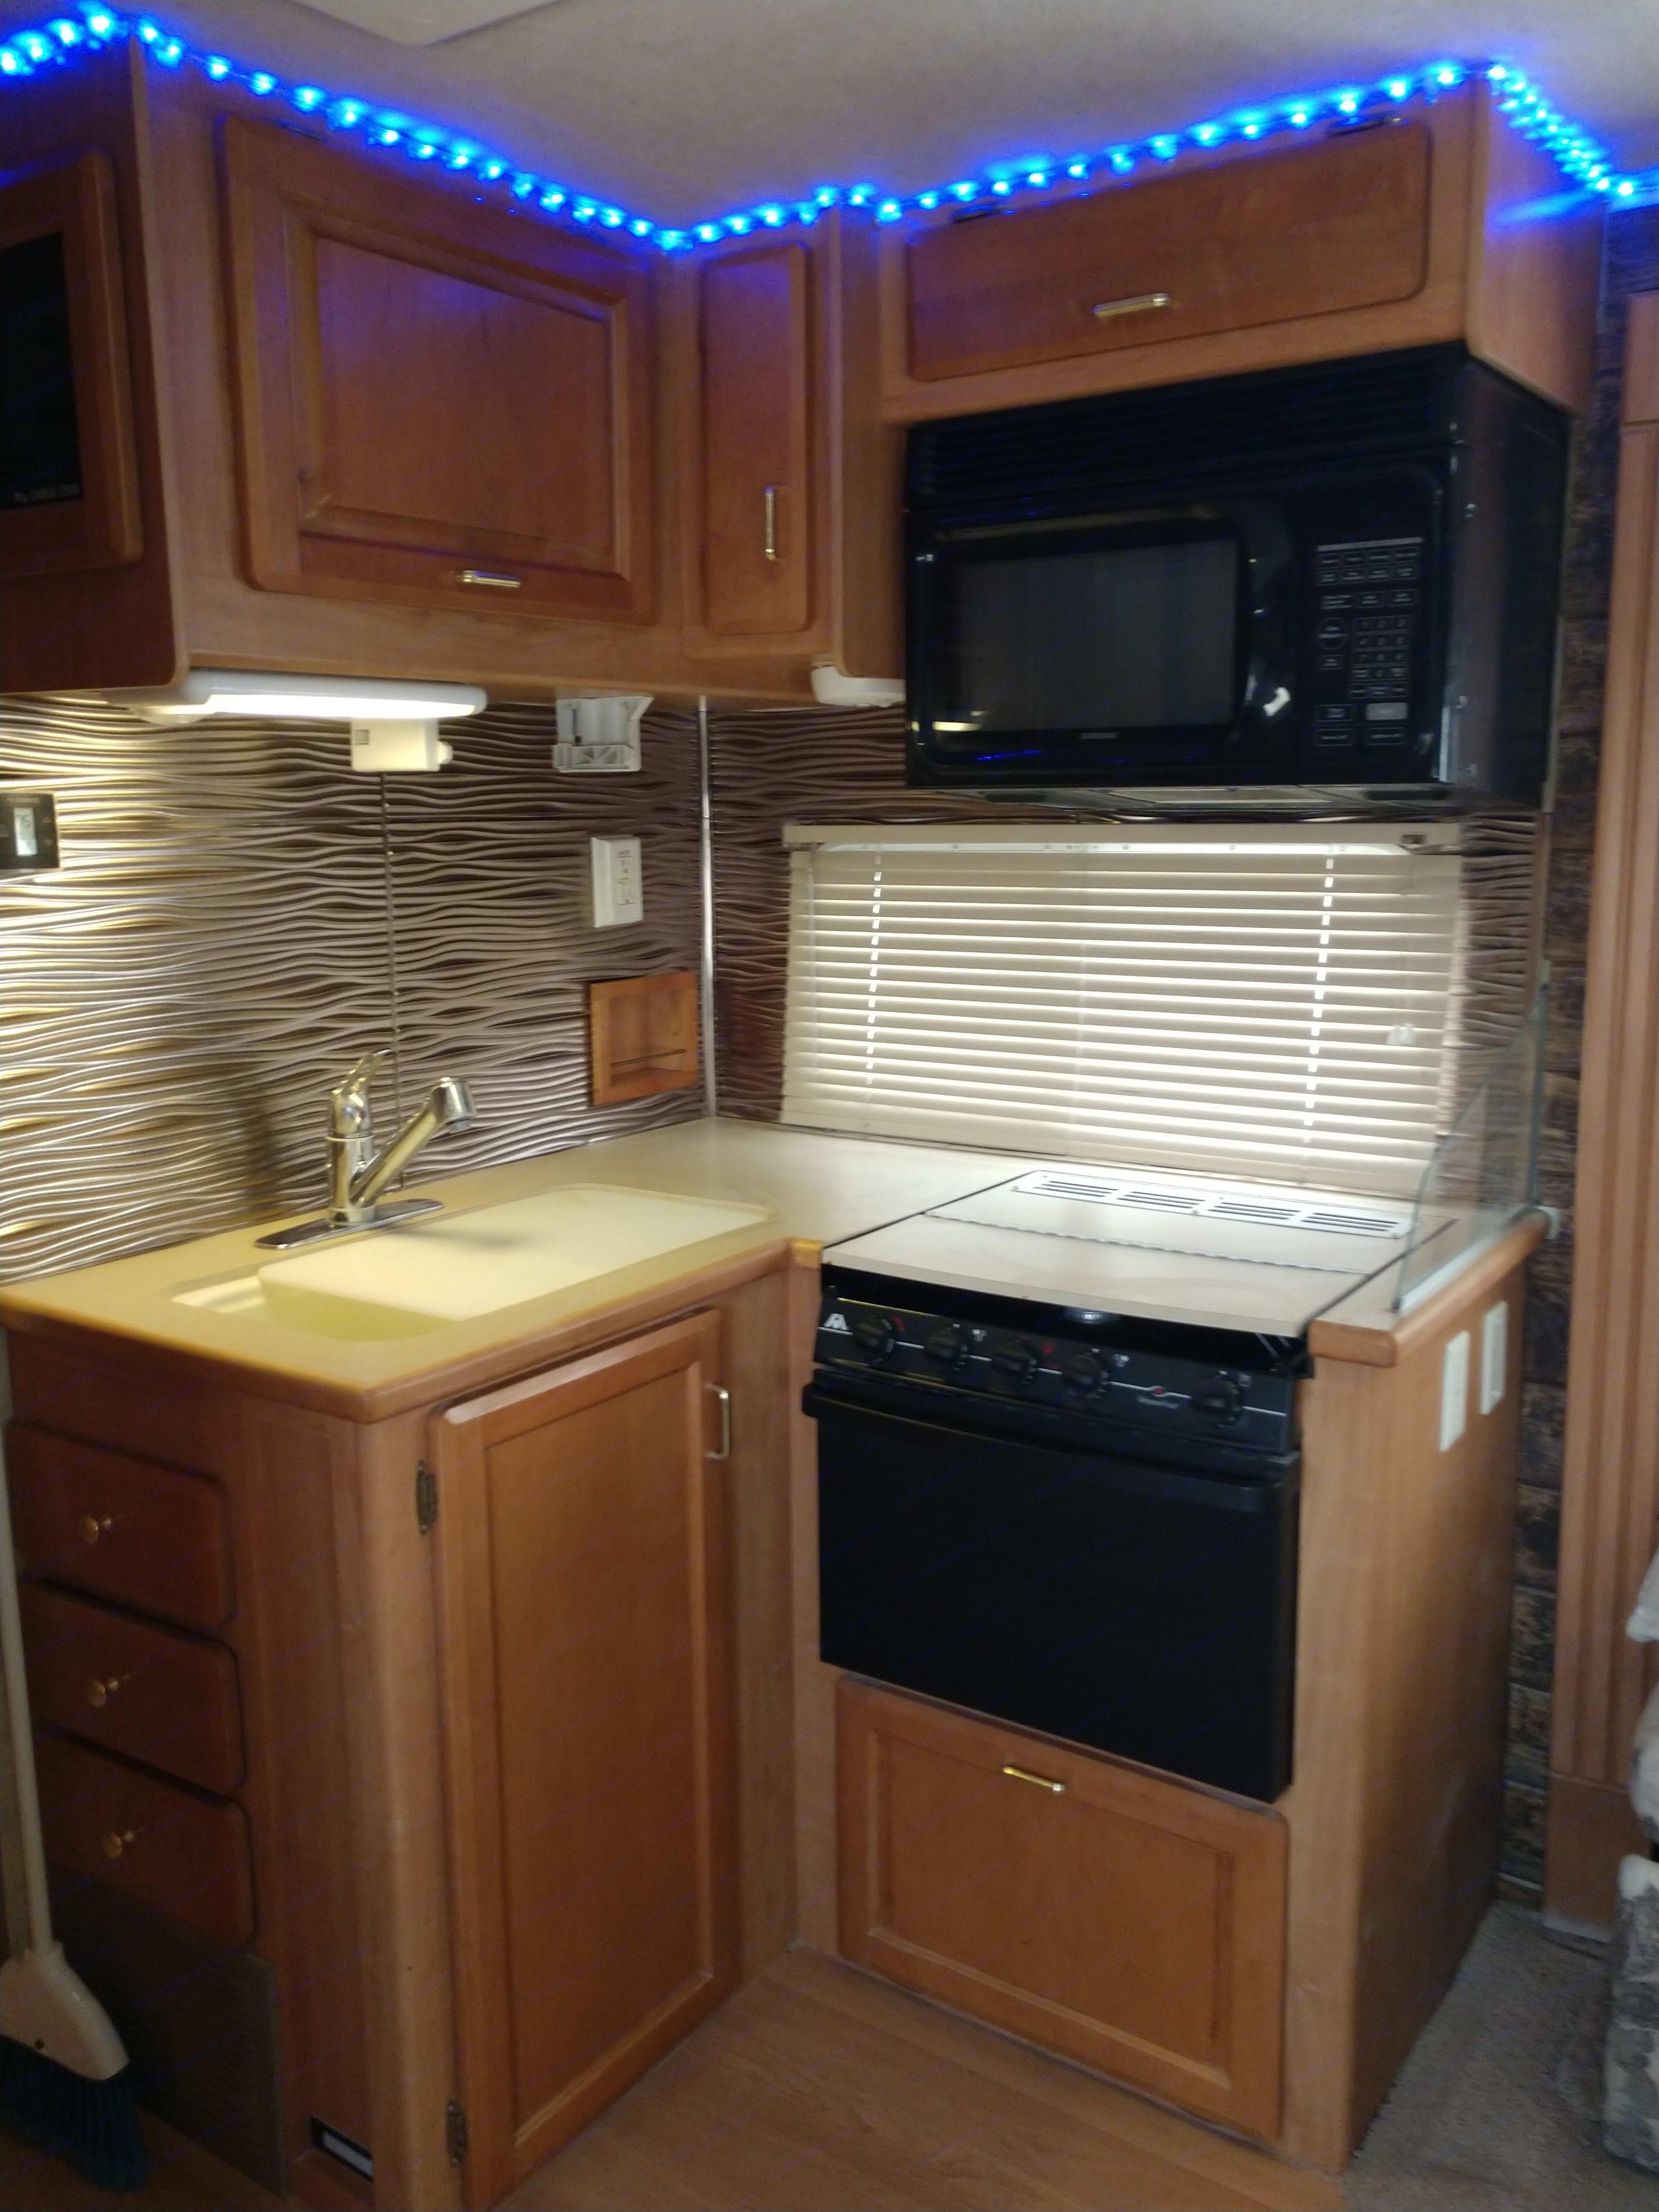 Spacious kitchen with all the amenities. Jayco Granite Ridge 2003